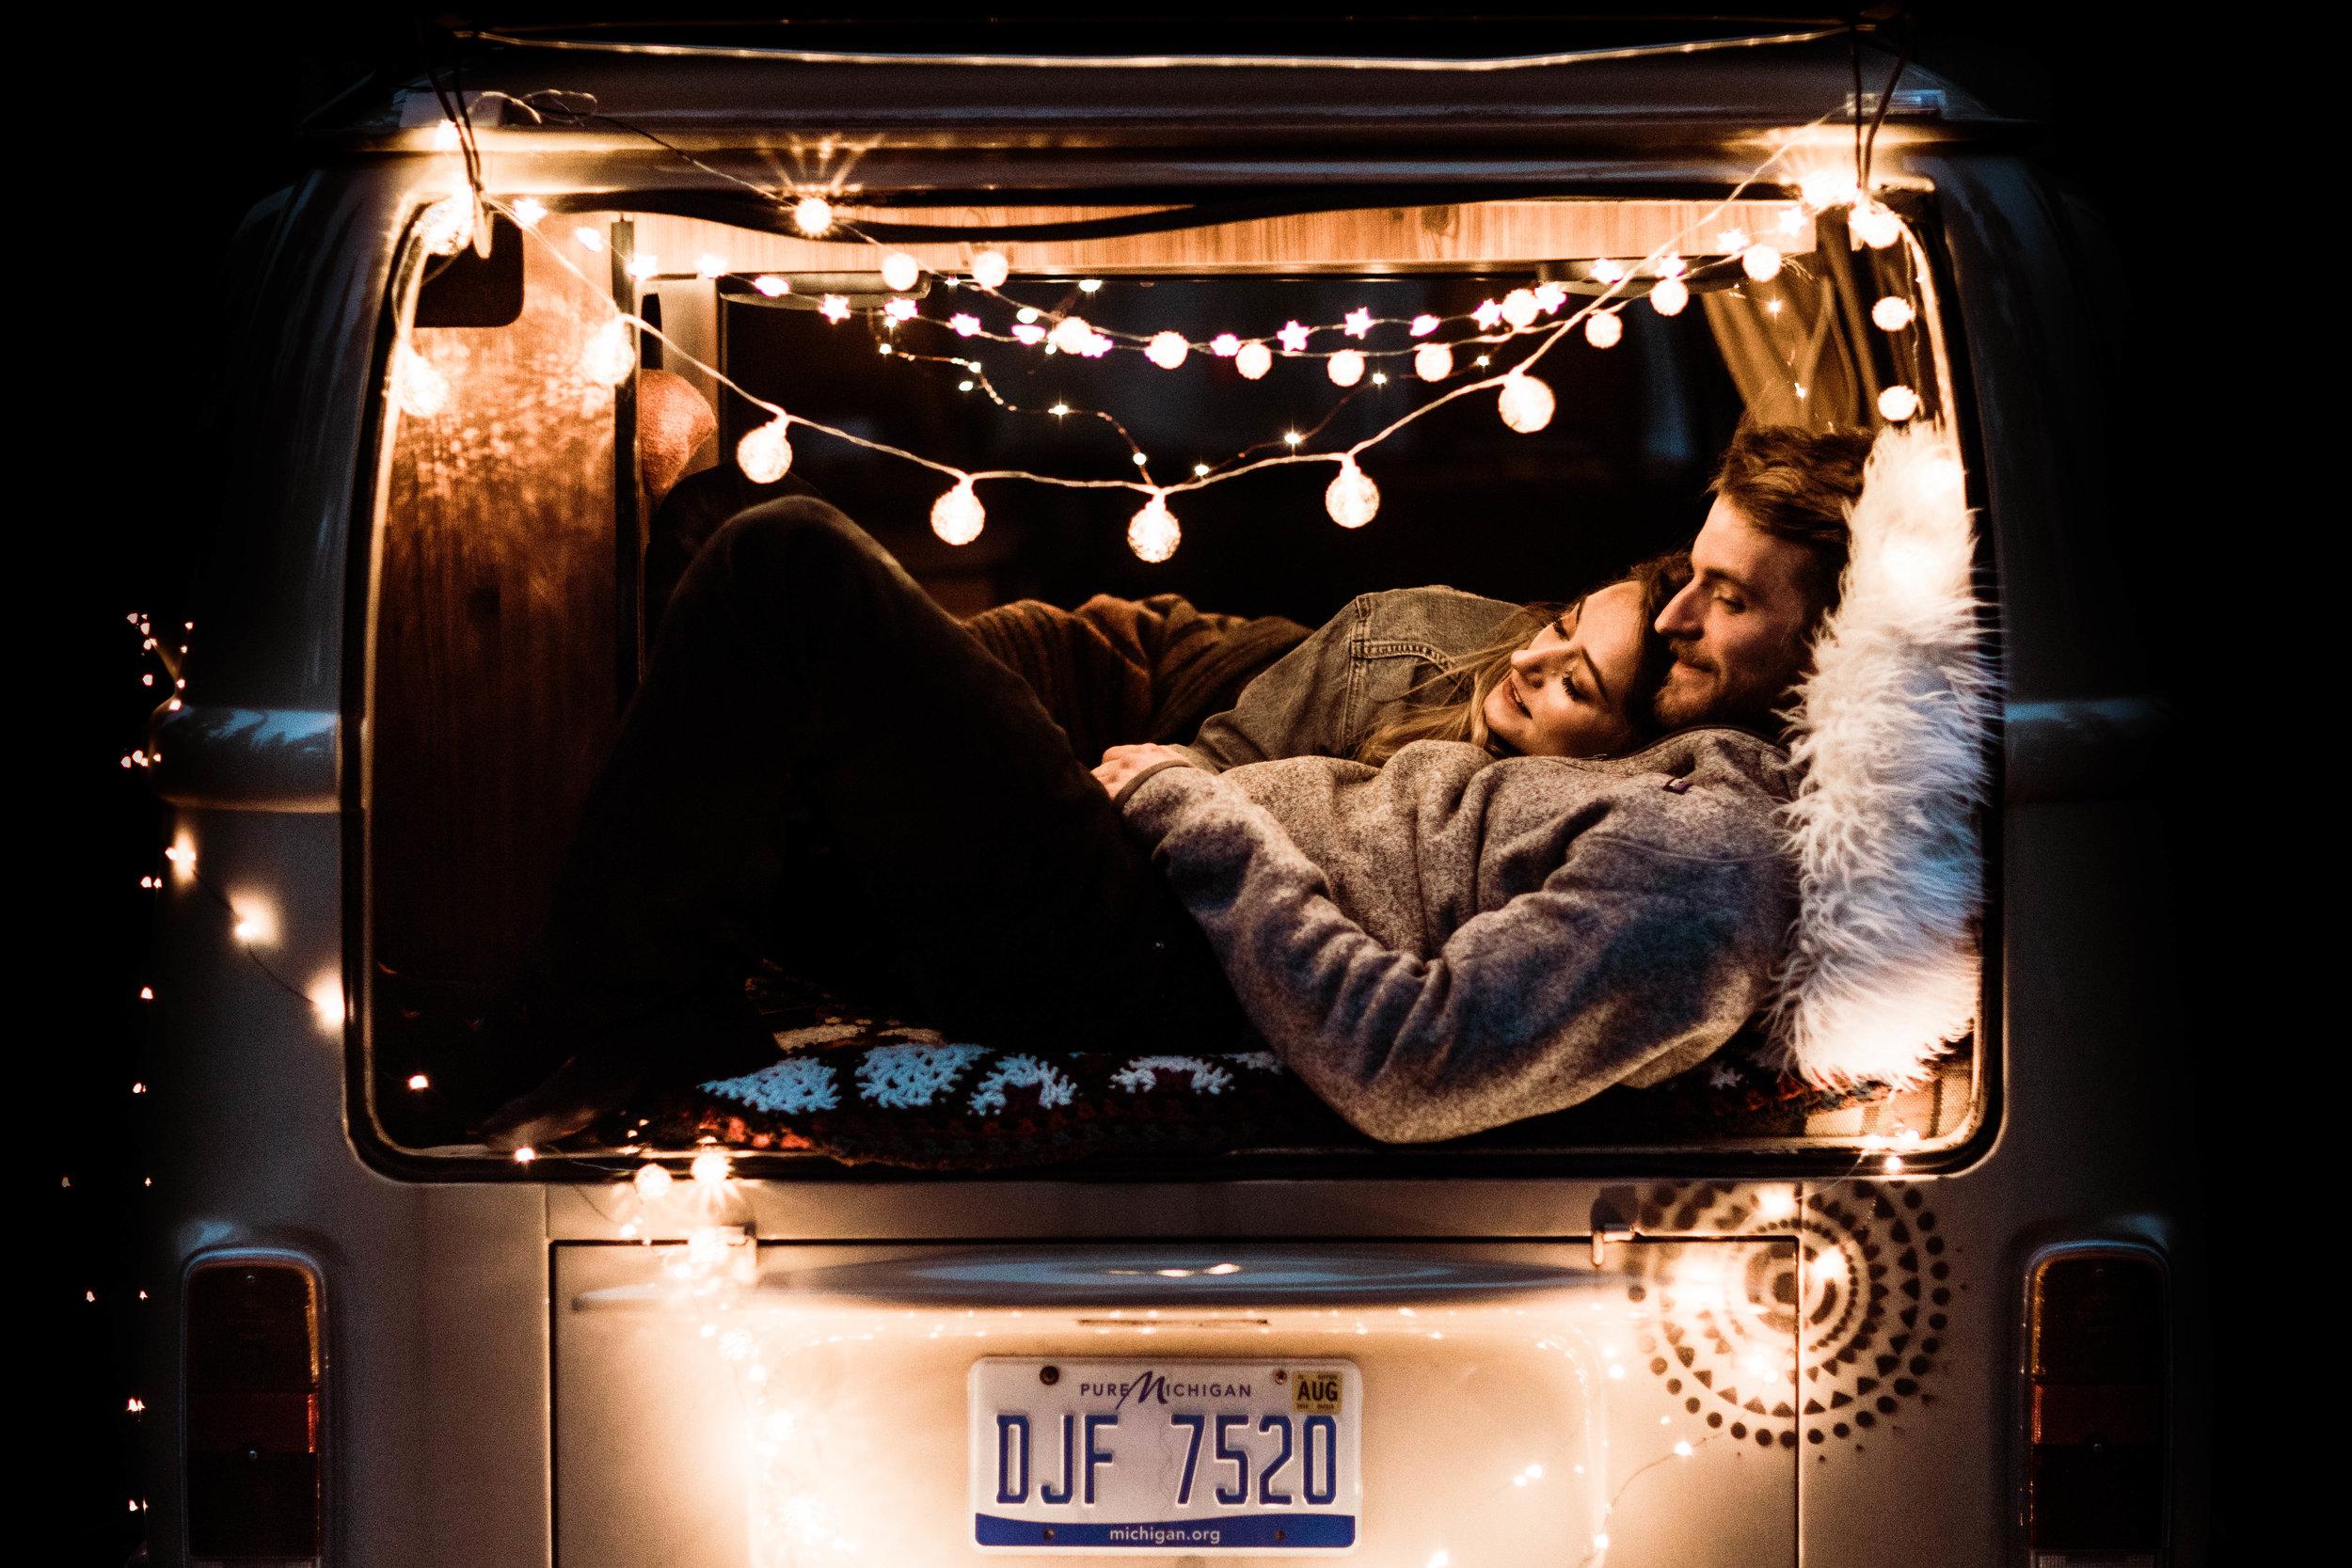 post elopement couples photos inside a vintage camper van | Rocky Mountain adventure elopement photographers